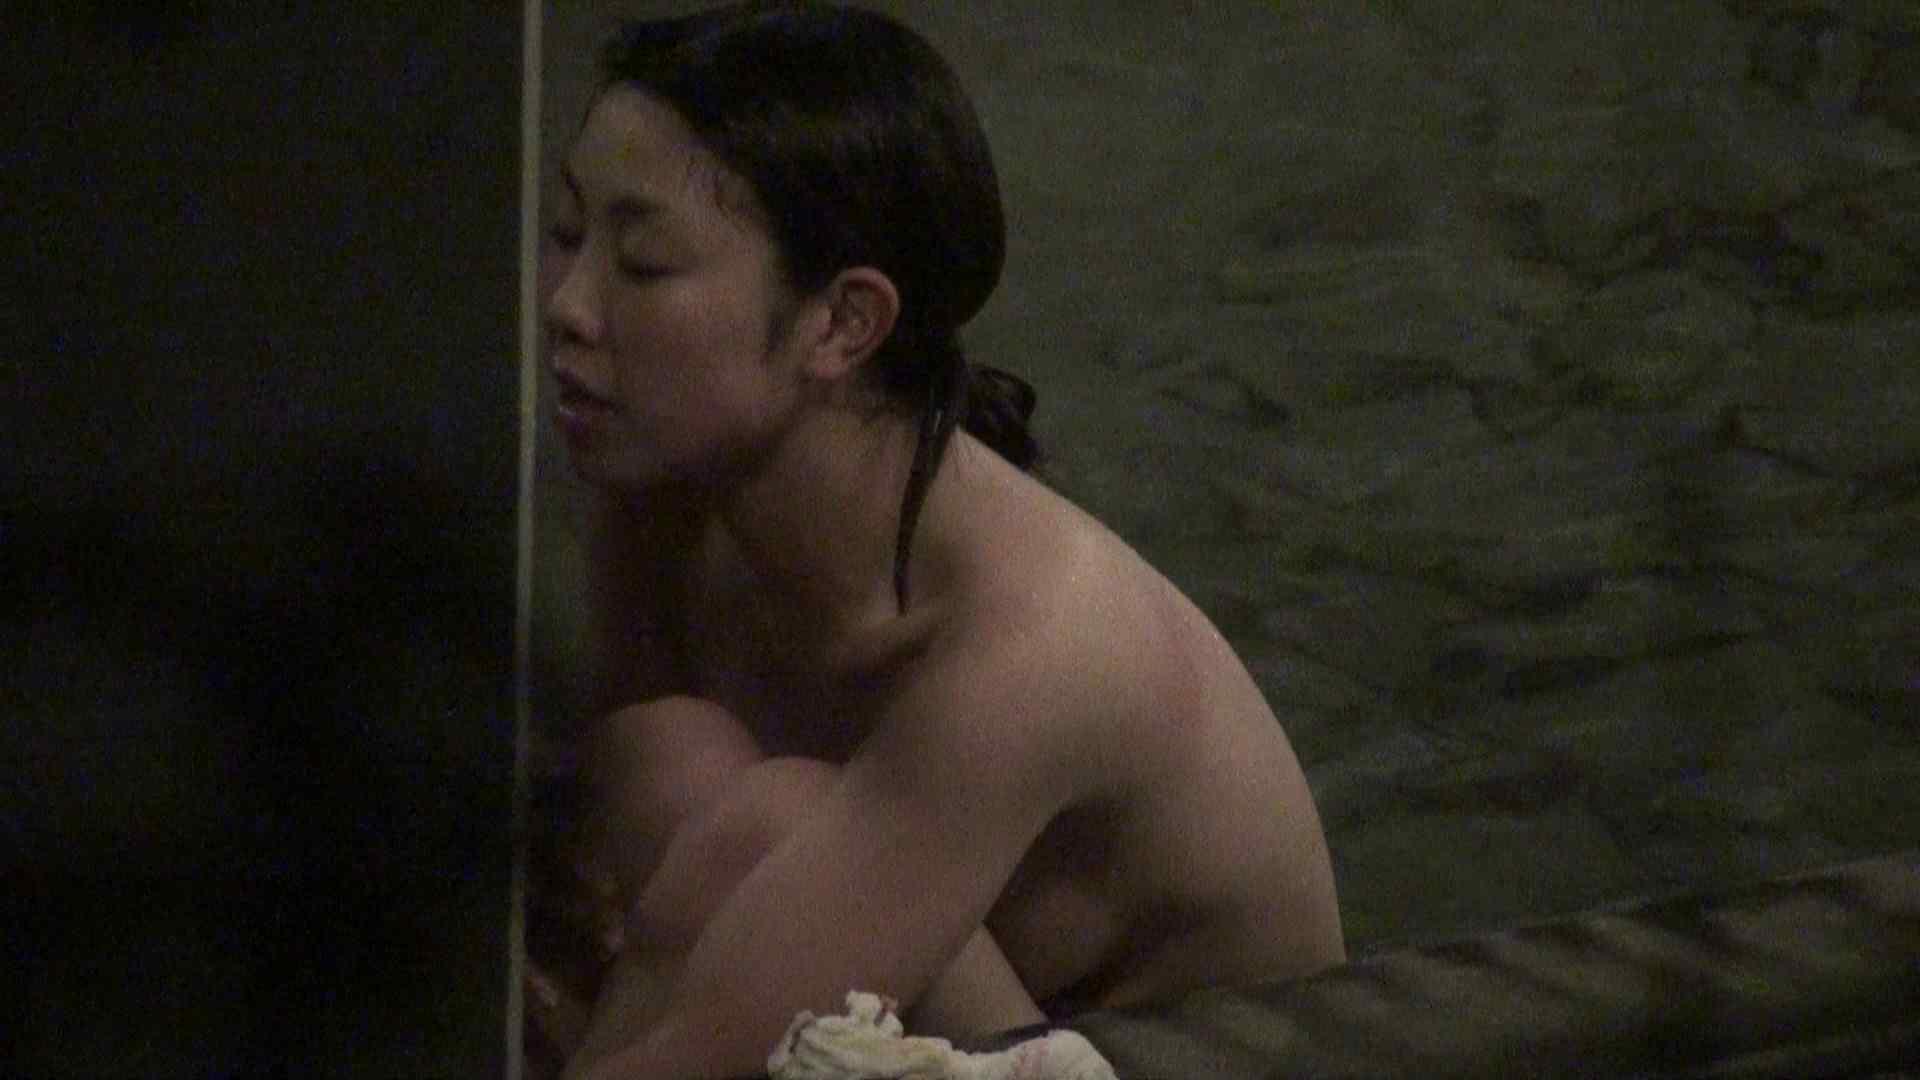 Aquaな露天風呂Vol.330 OLのエロ生活 | 露天風呂  101連発 67